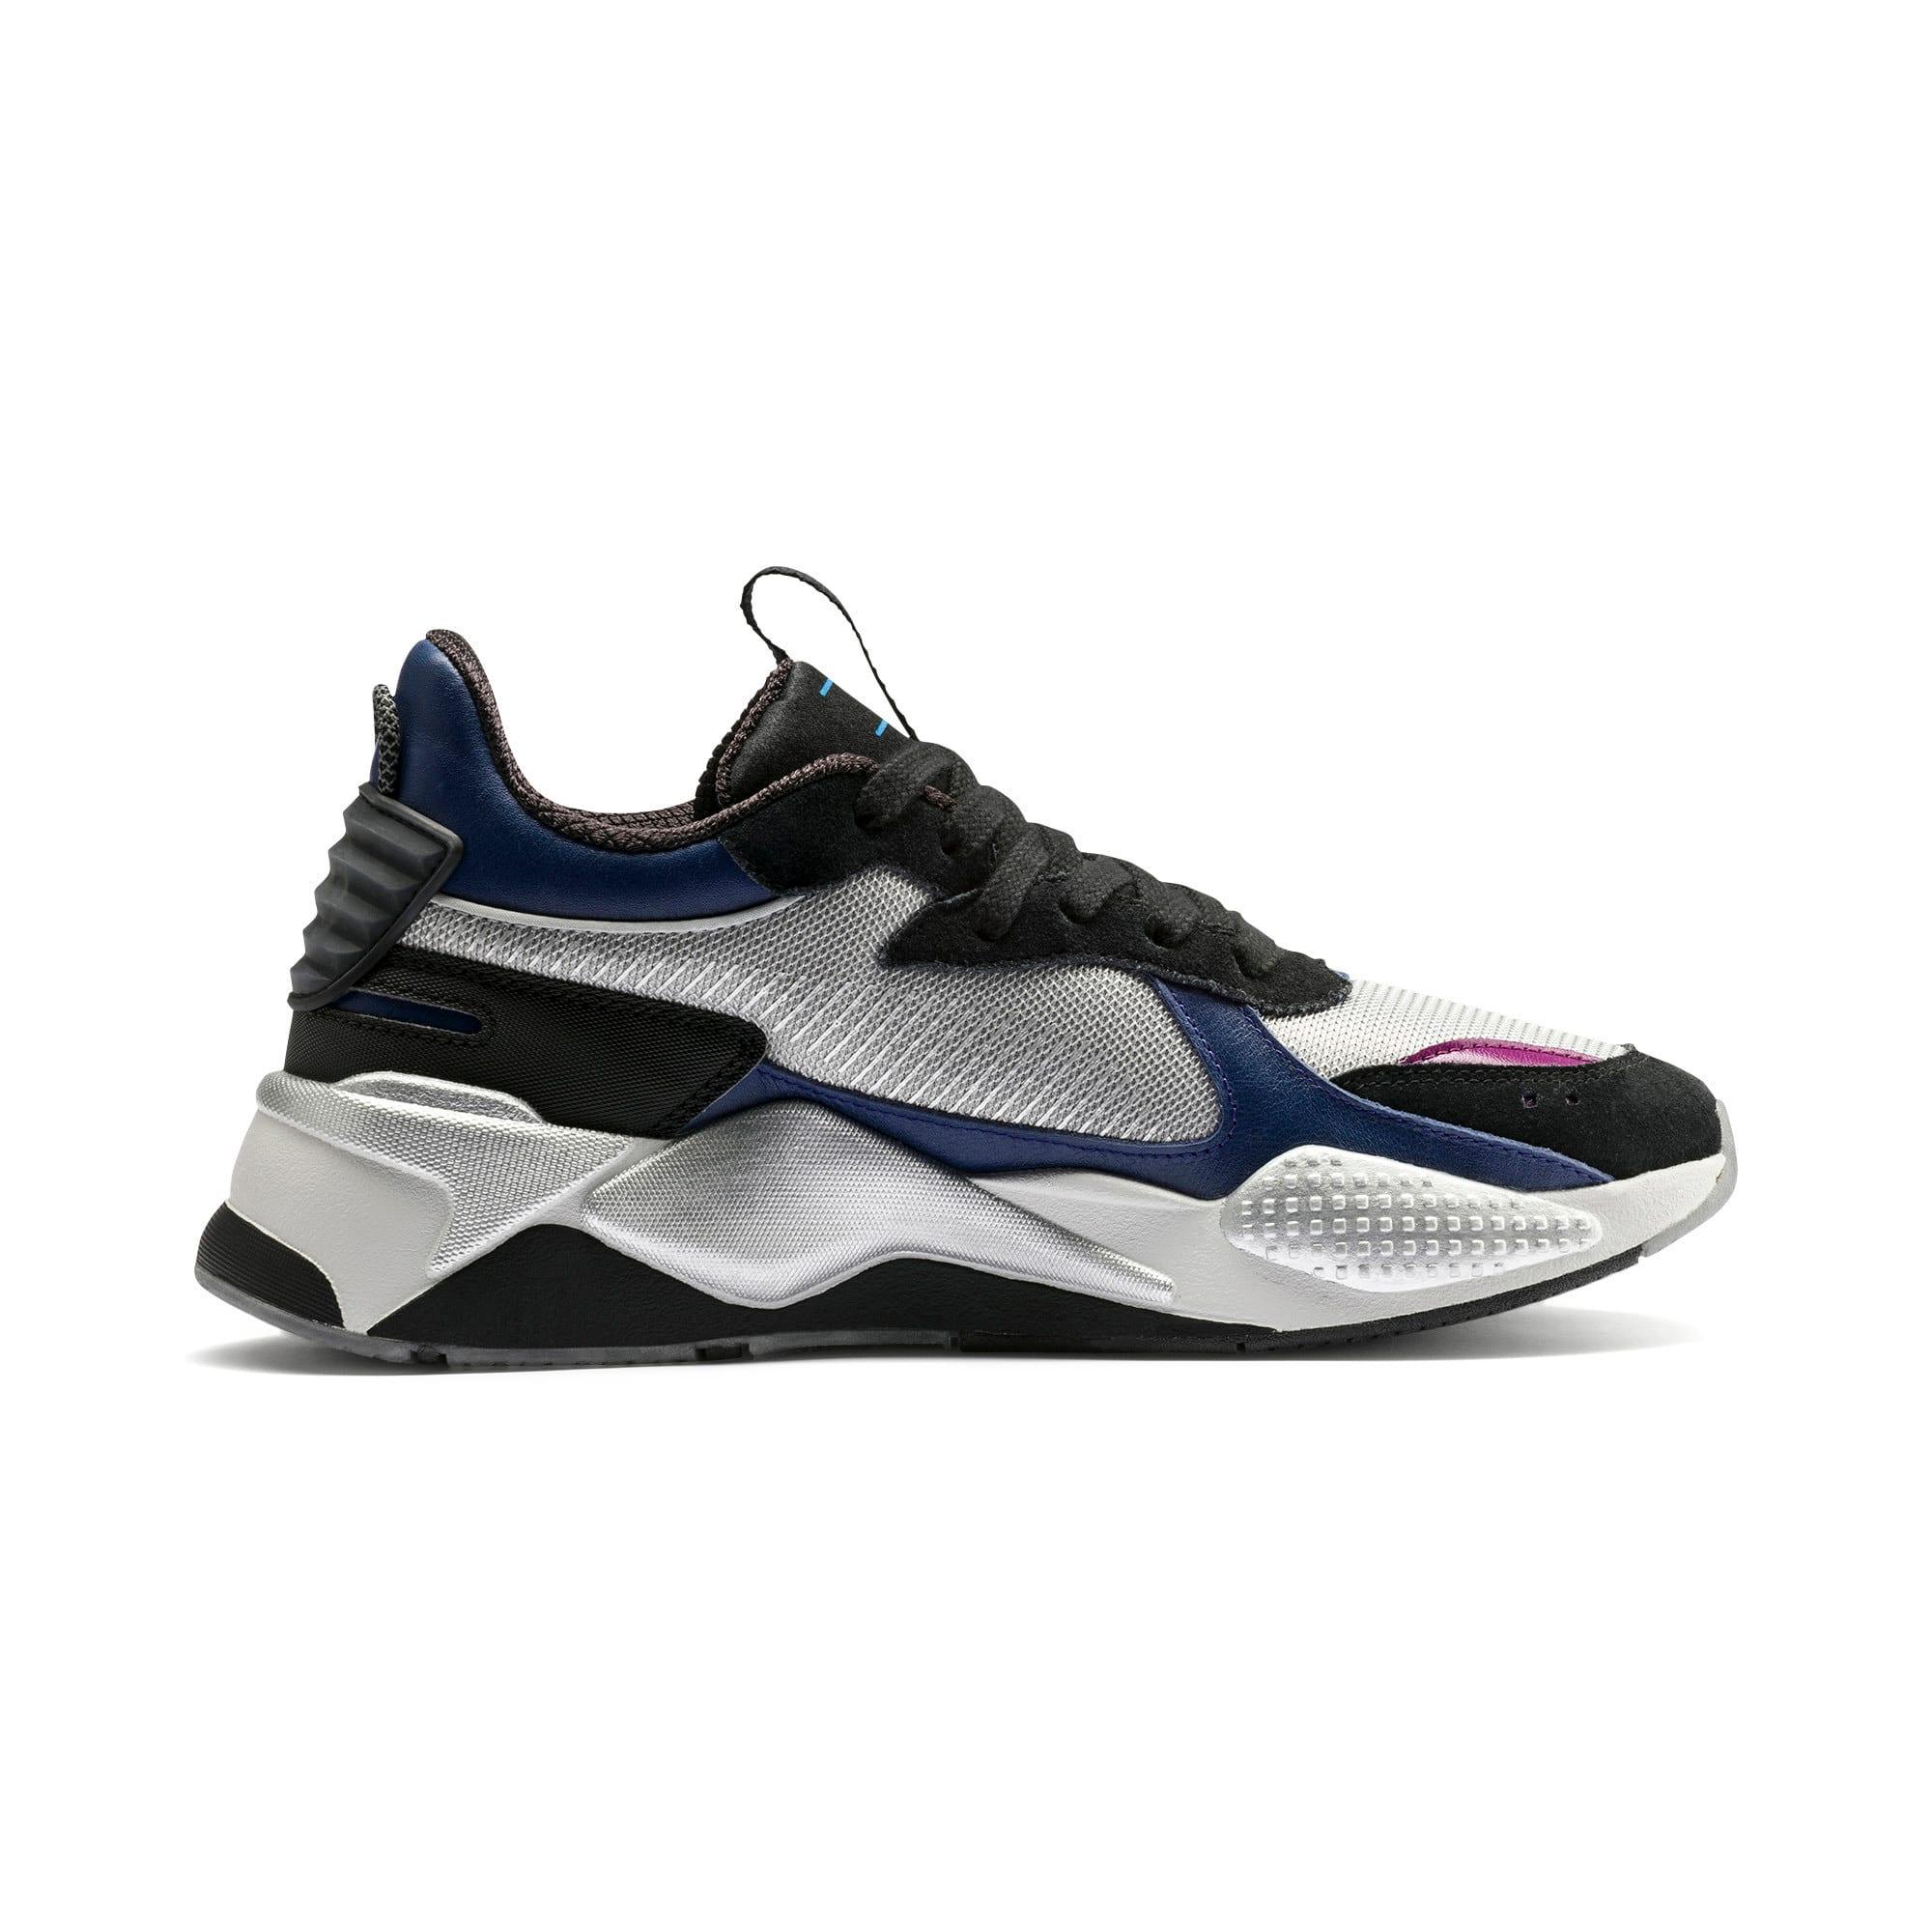 Thumbnail 5 of RS-X Tech Motorola Sneakers, Puma Silver-Sodalite Blue, medium